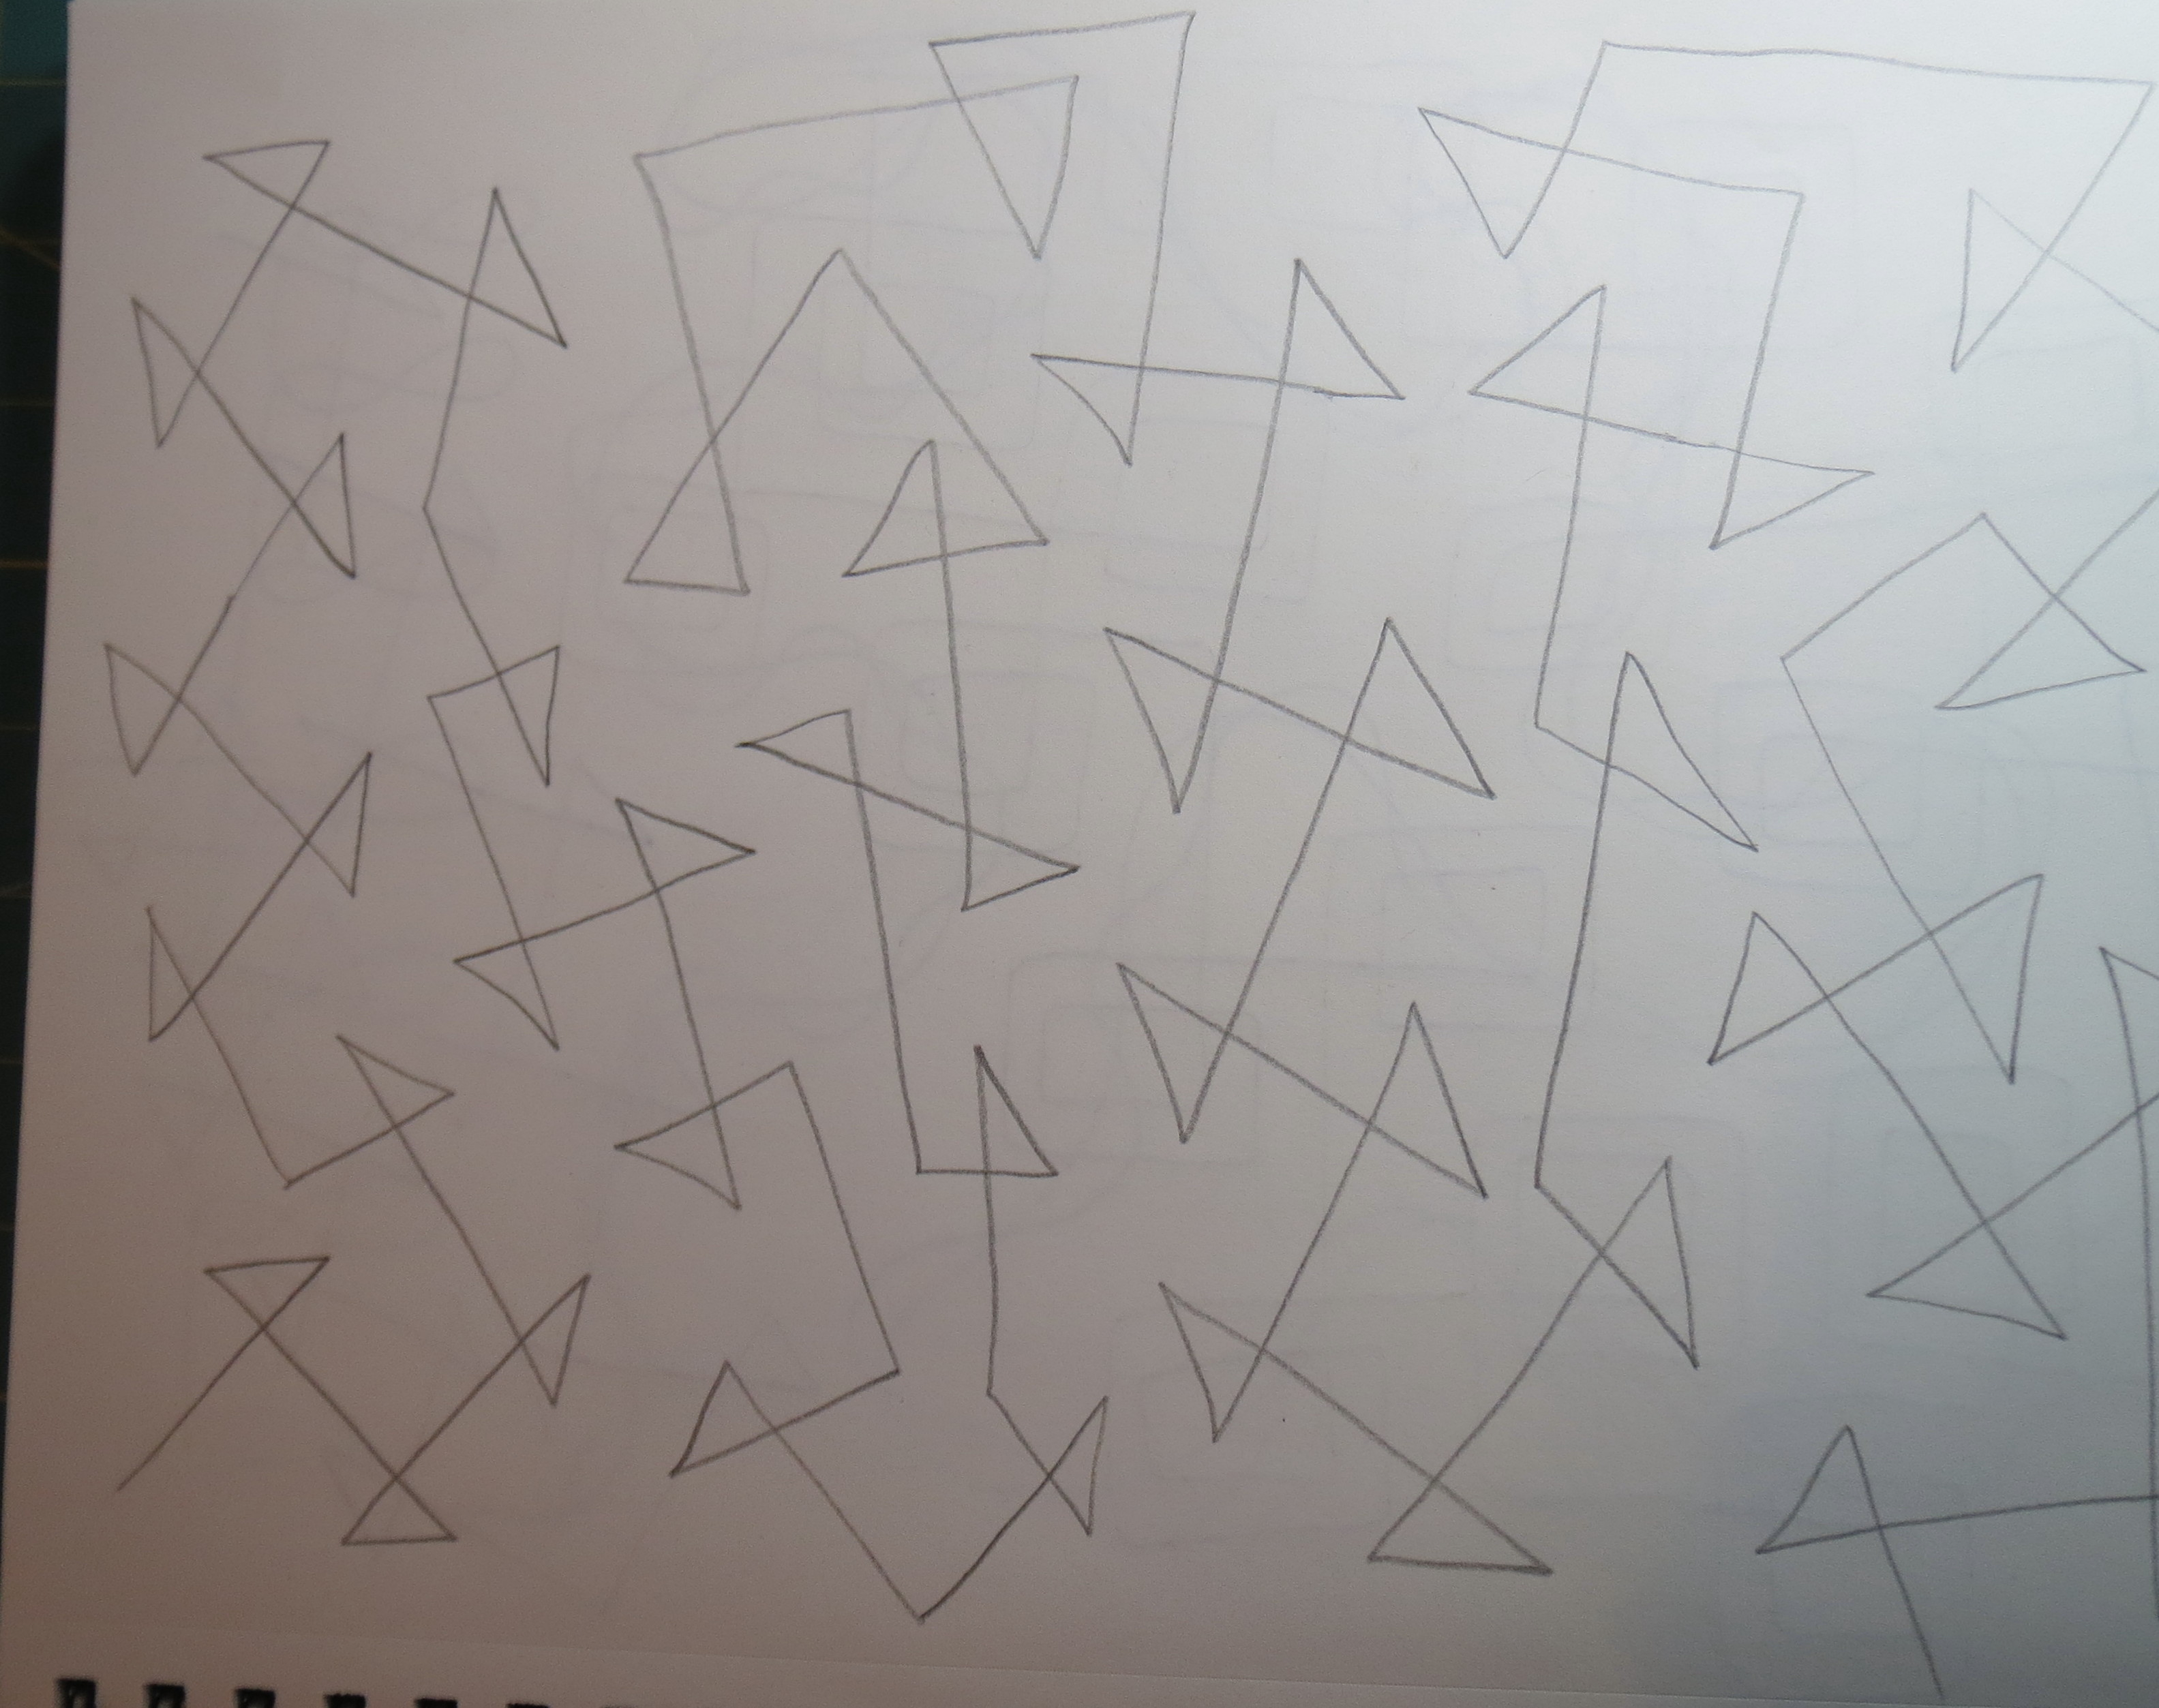 Modern Free Motion Quilting Patterns : Free Motion Quilting Patterns for Modern Quilts Mystery Bay Quilt Design